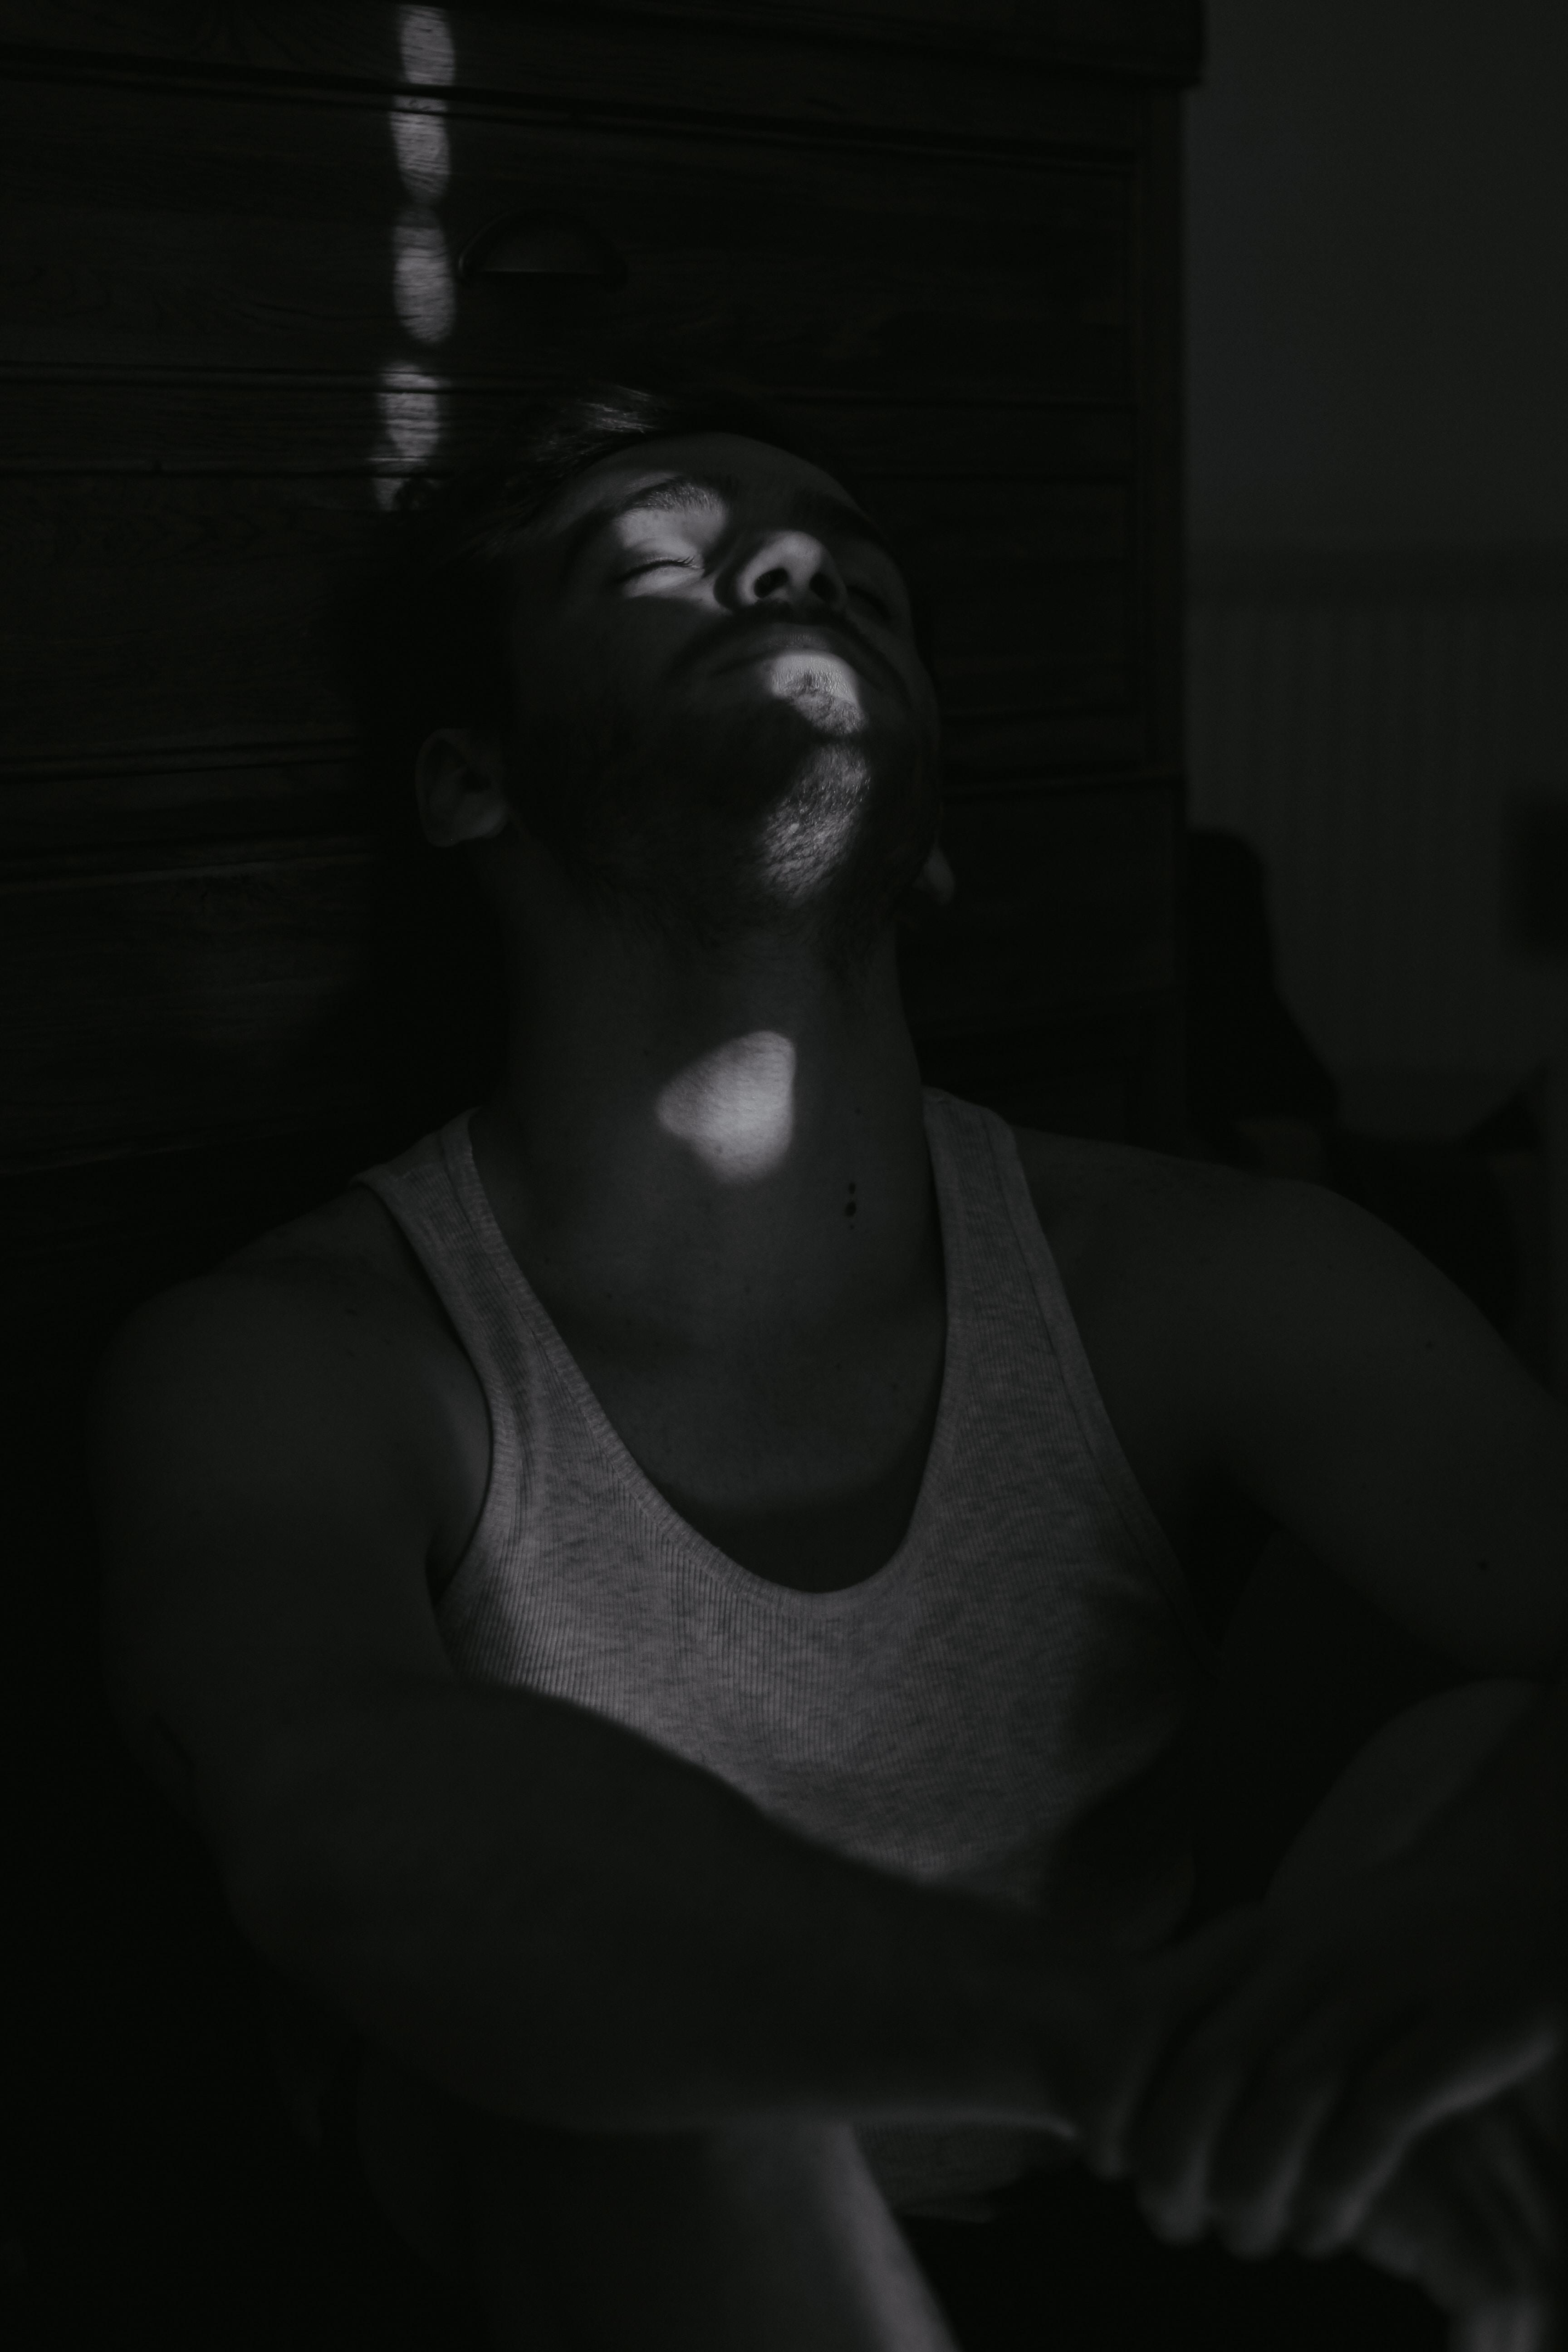 black and white crew neck shirt